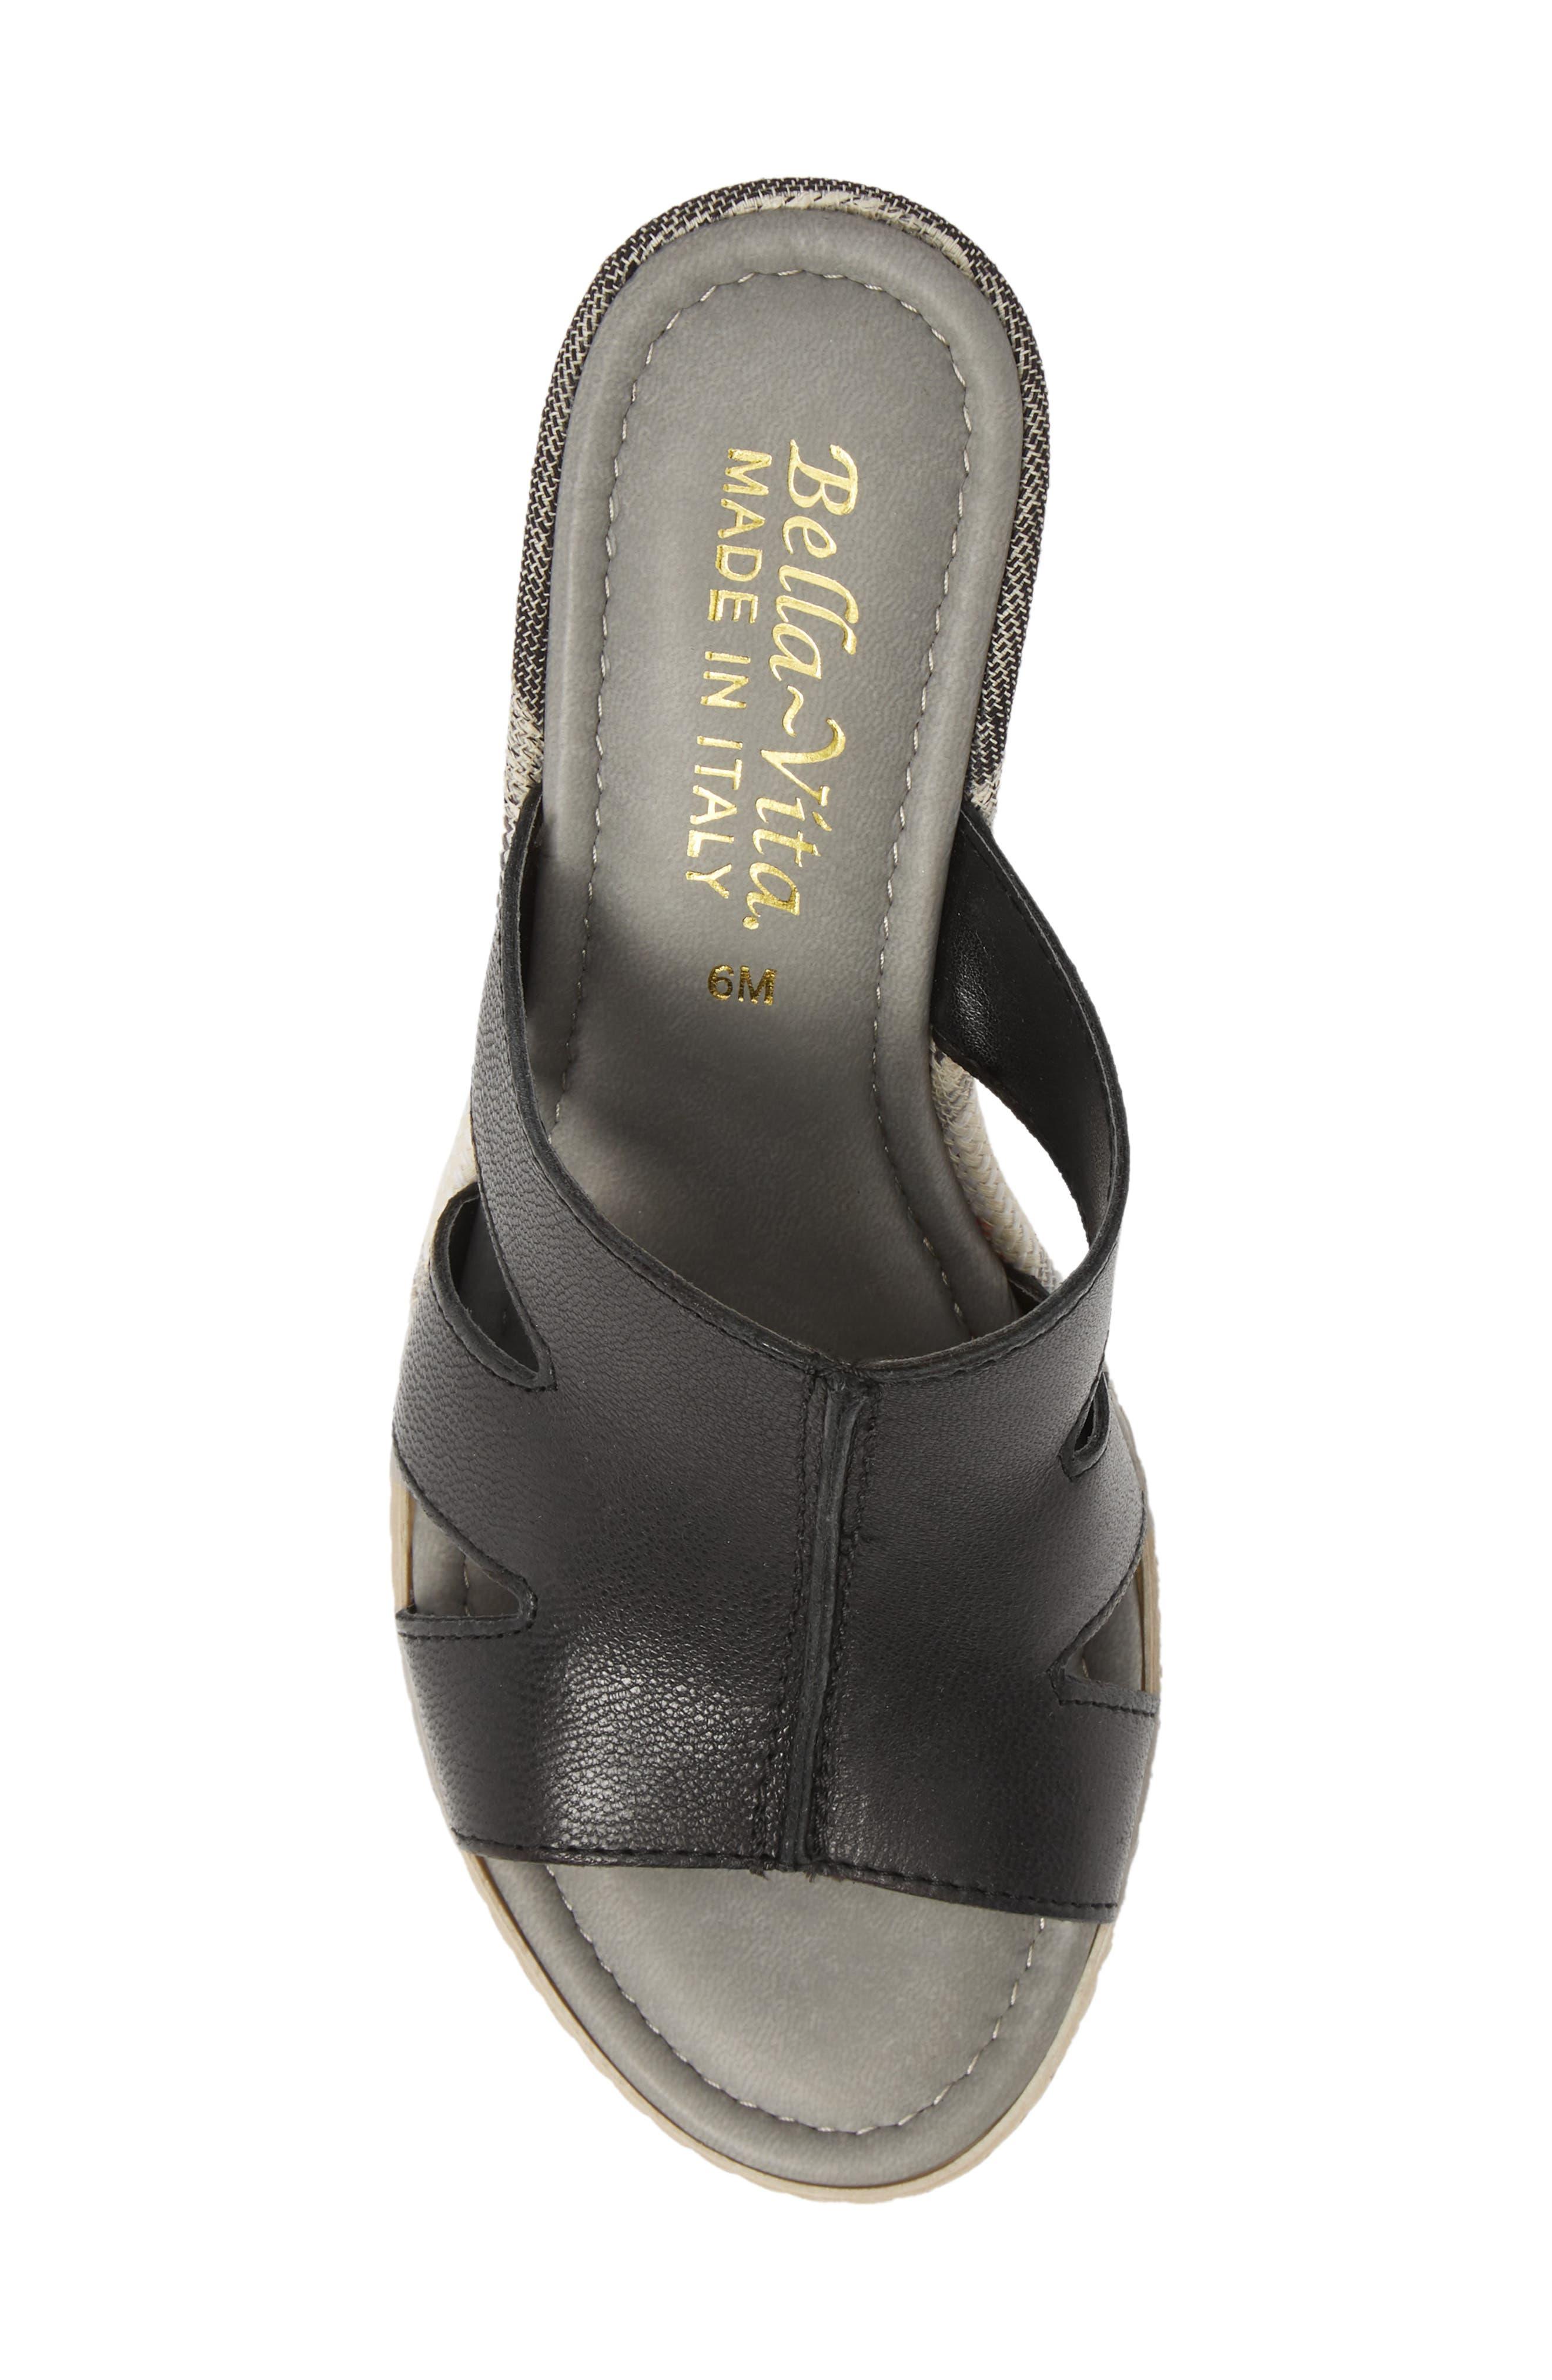 BELLA VITA, Rox Wedge Slide Sandal, Alternate thumbnail 5, color, BLACK ITALIAN LEATHER